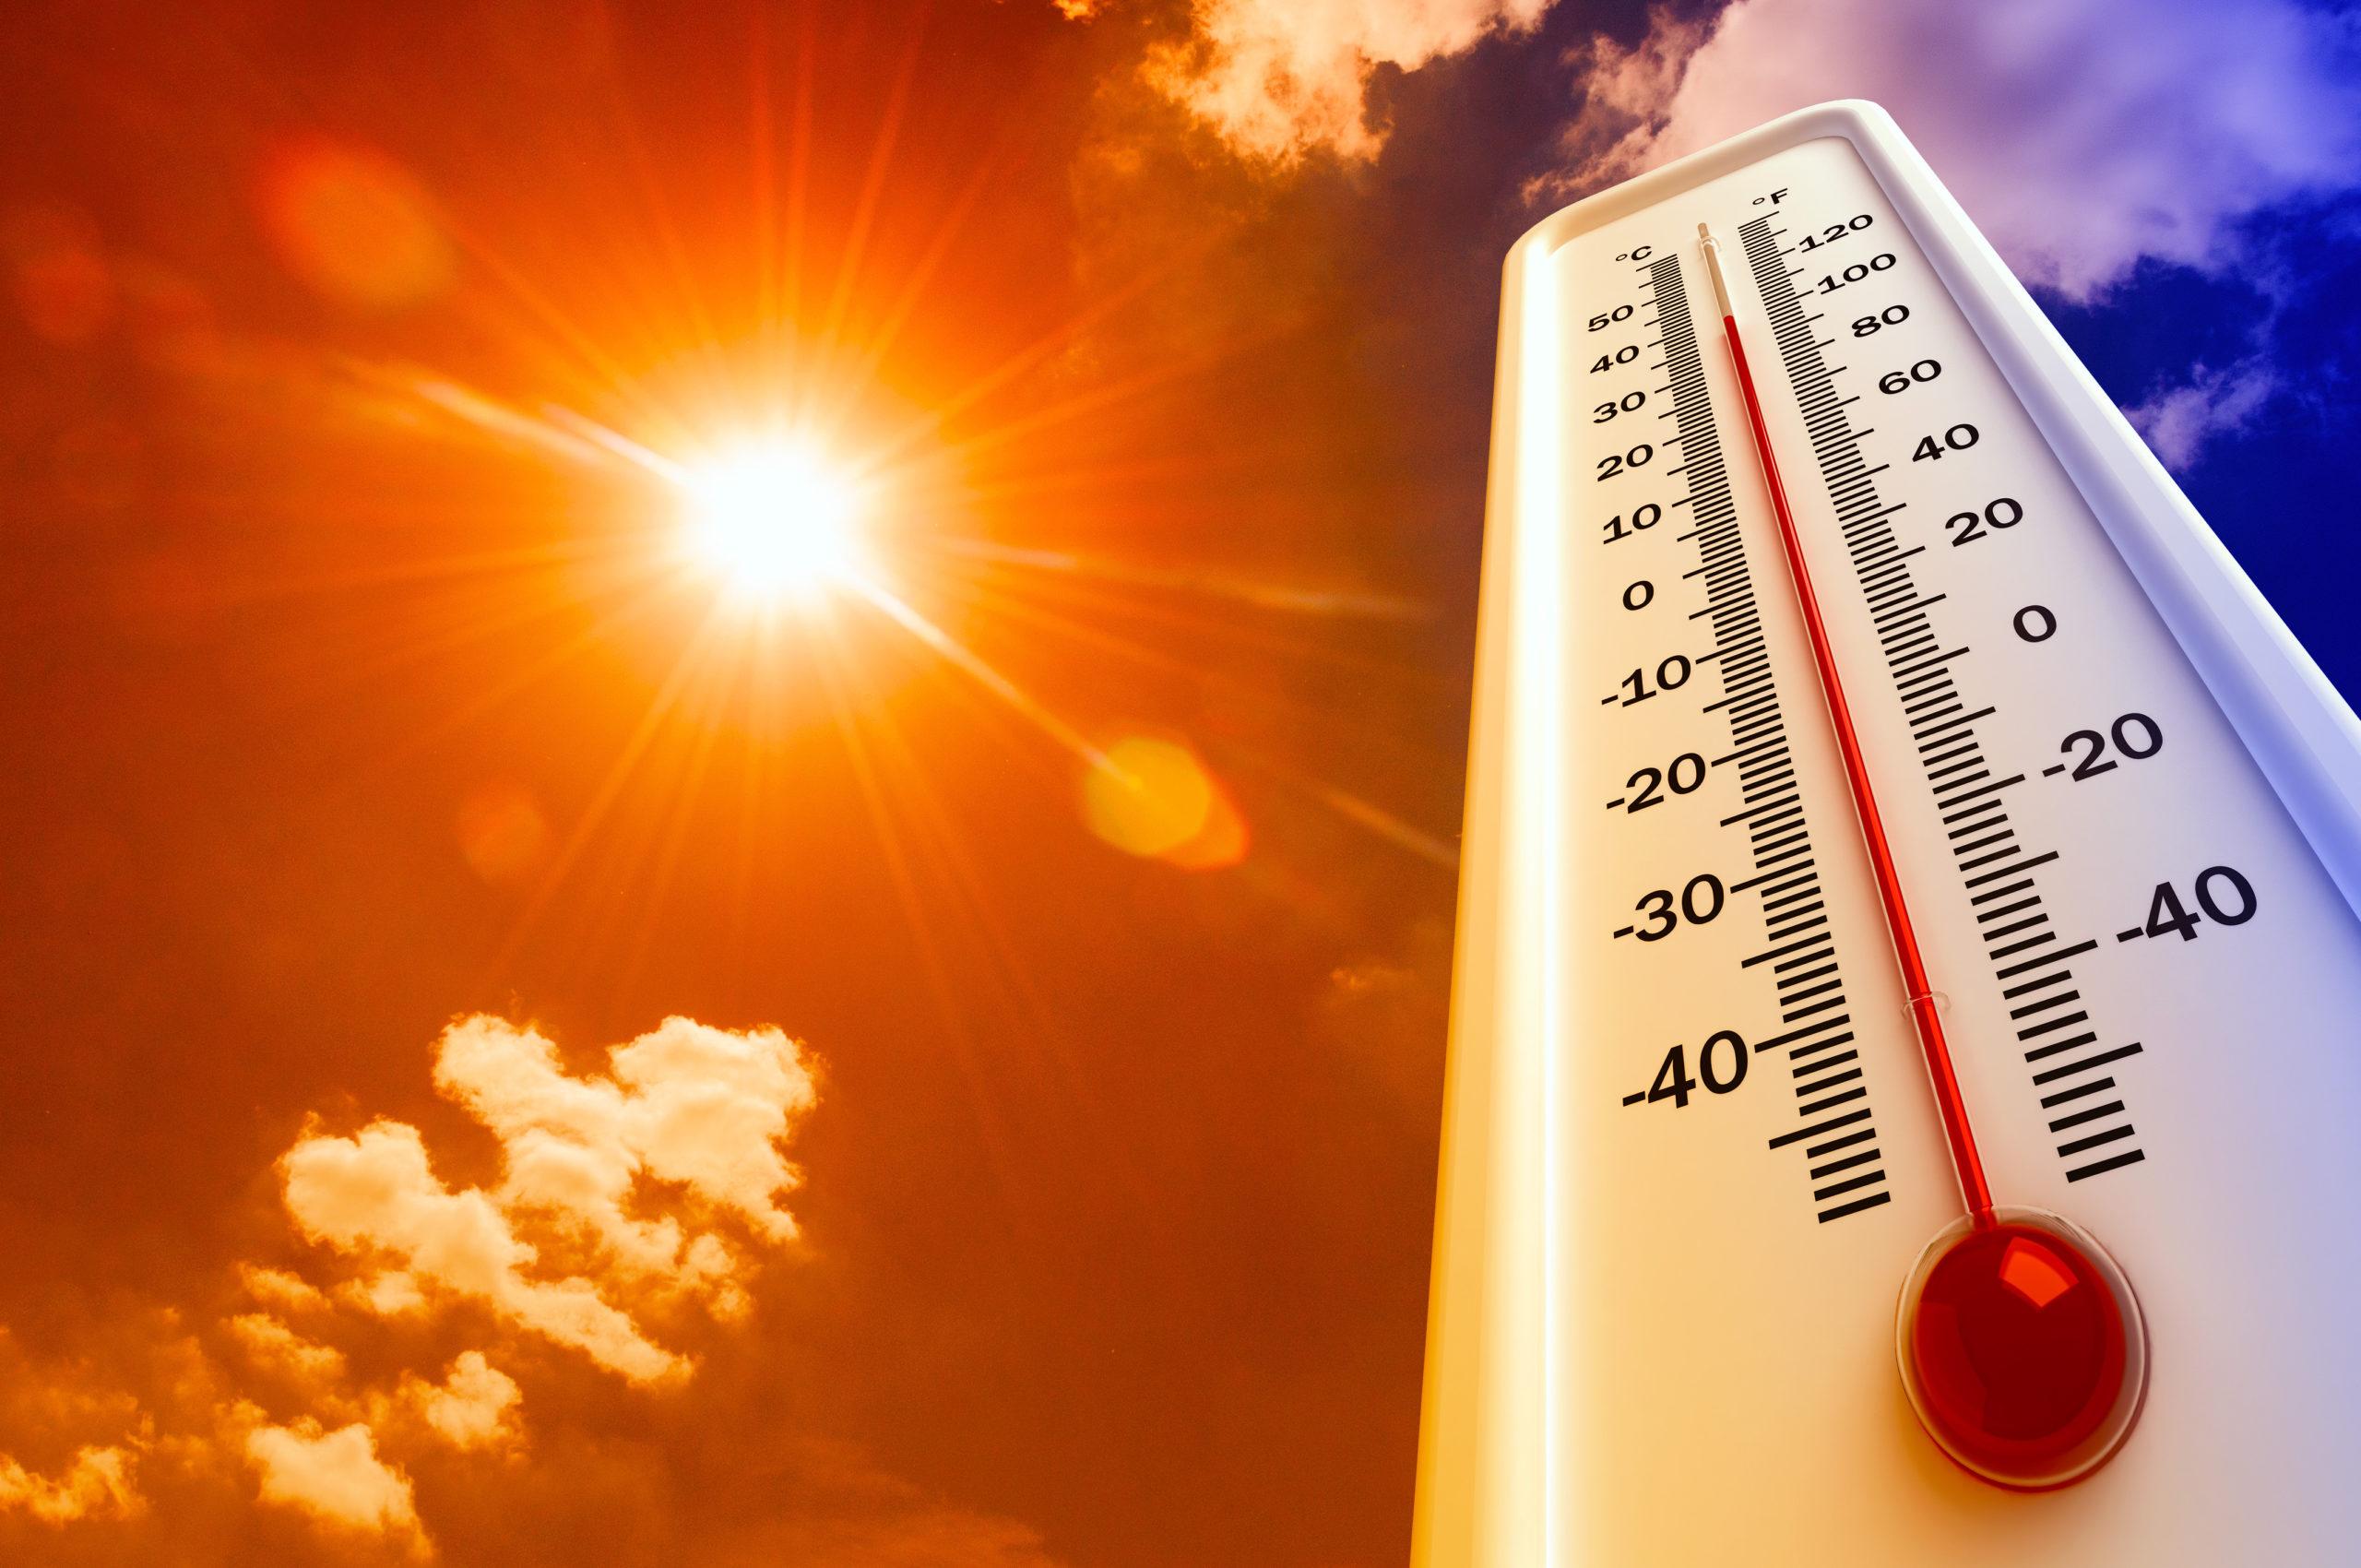 Le patologie da calore